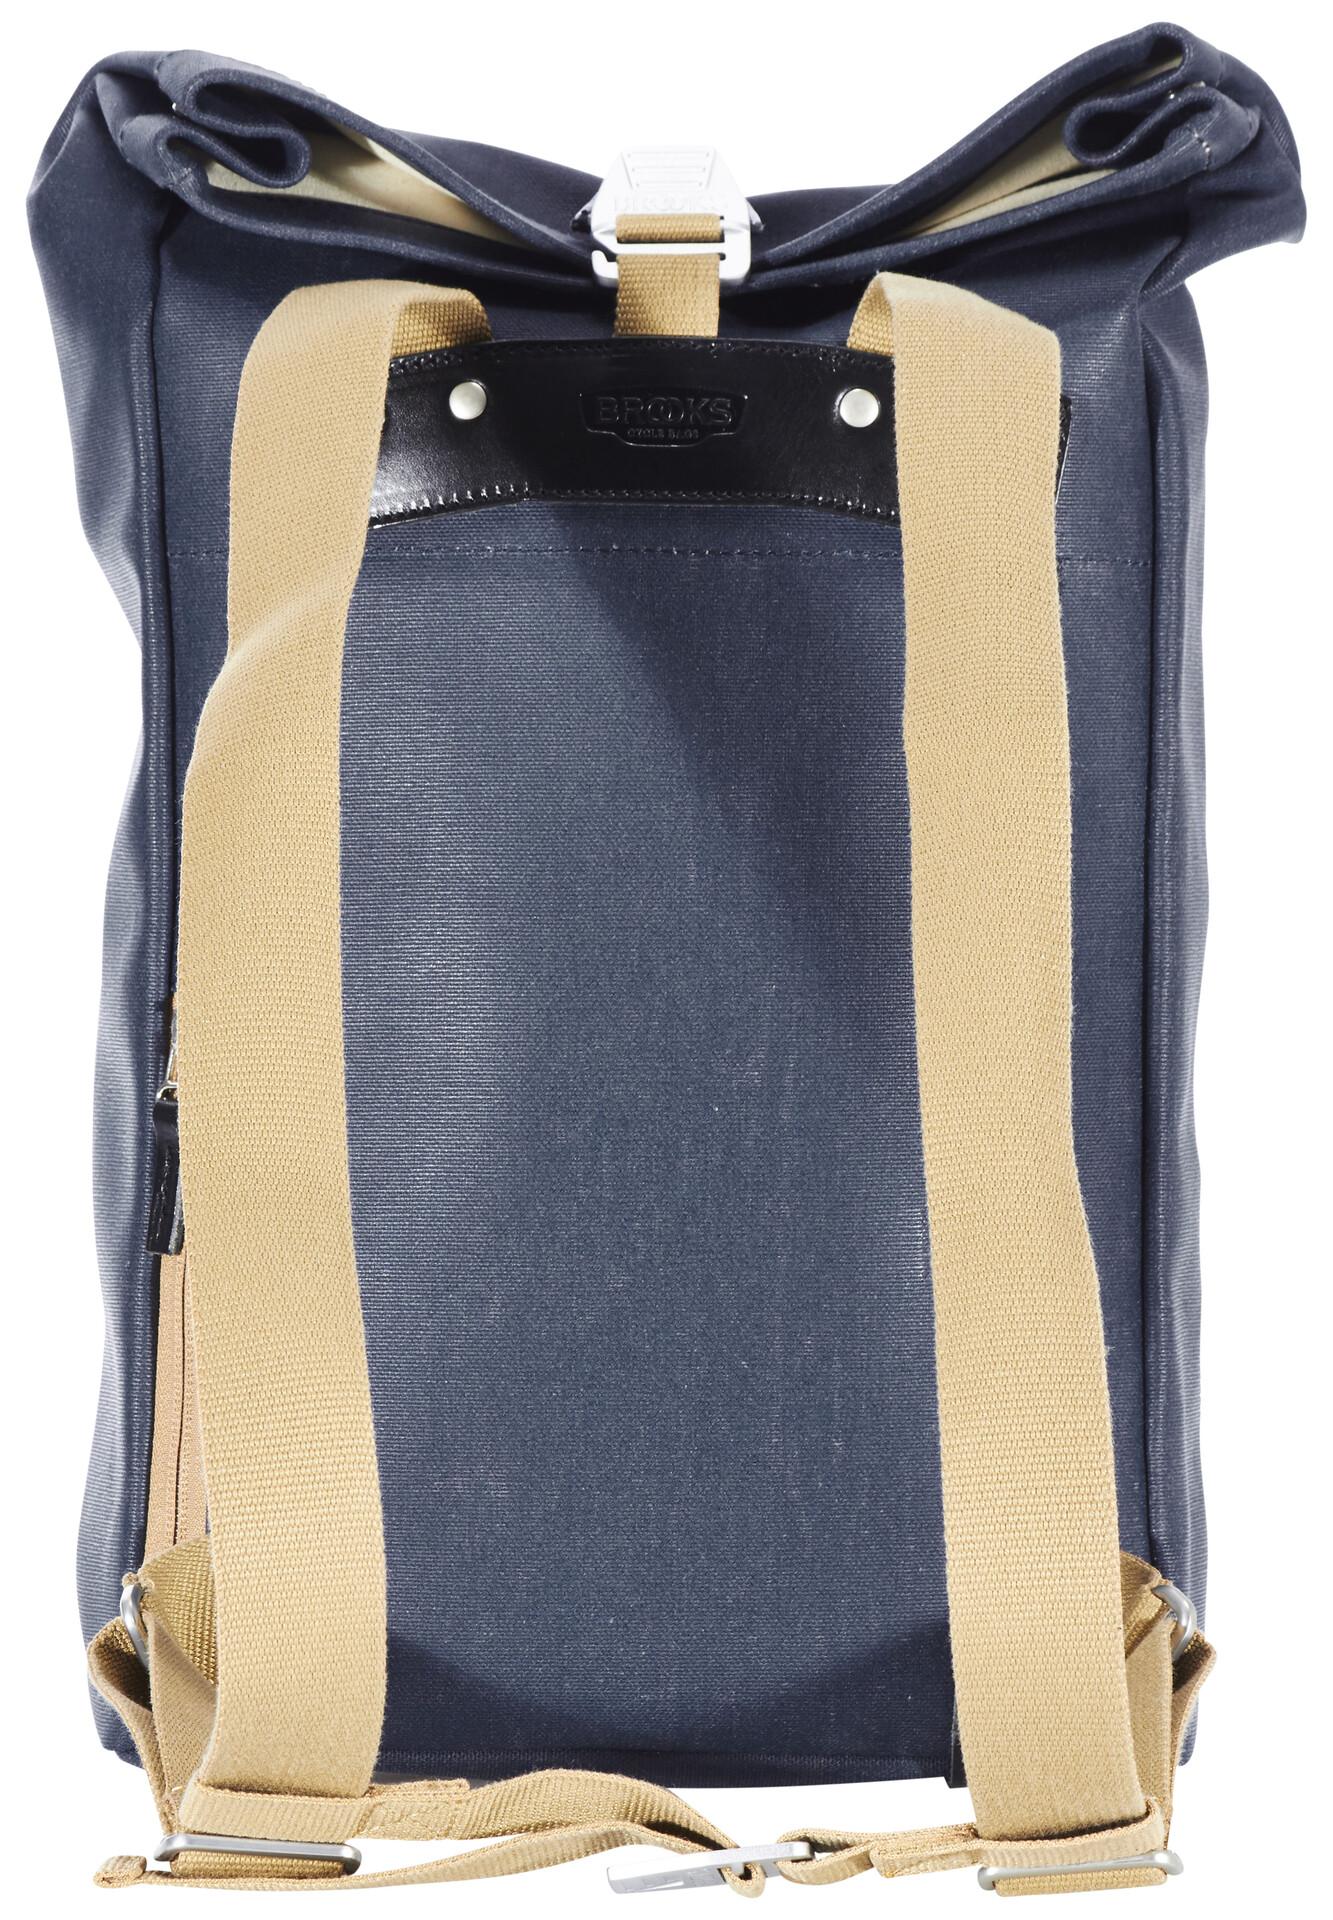 Canvas Backpack Pickwick Small 12lDark Brooks Blueblack b76yYfgv